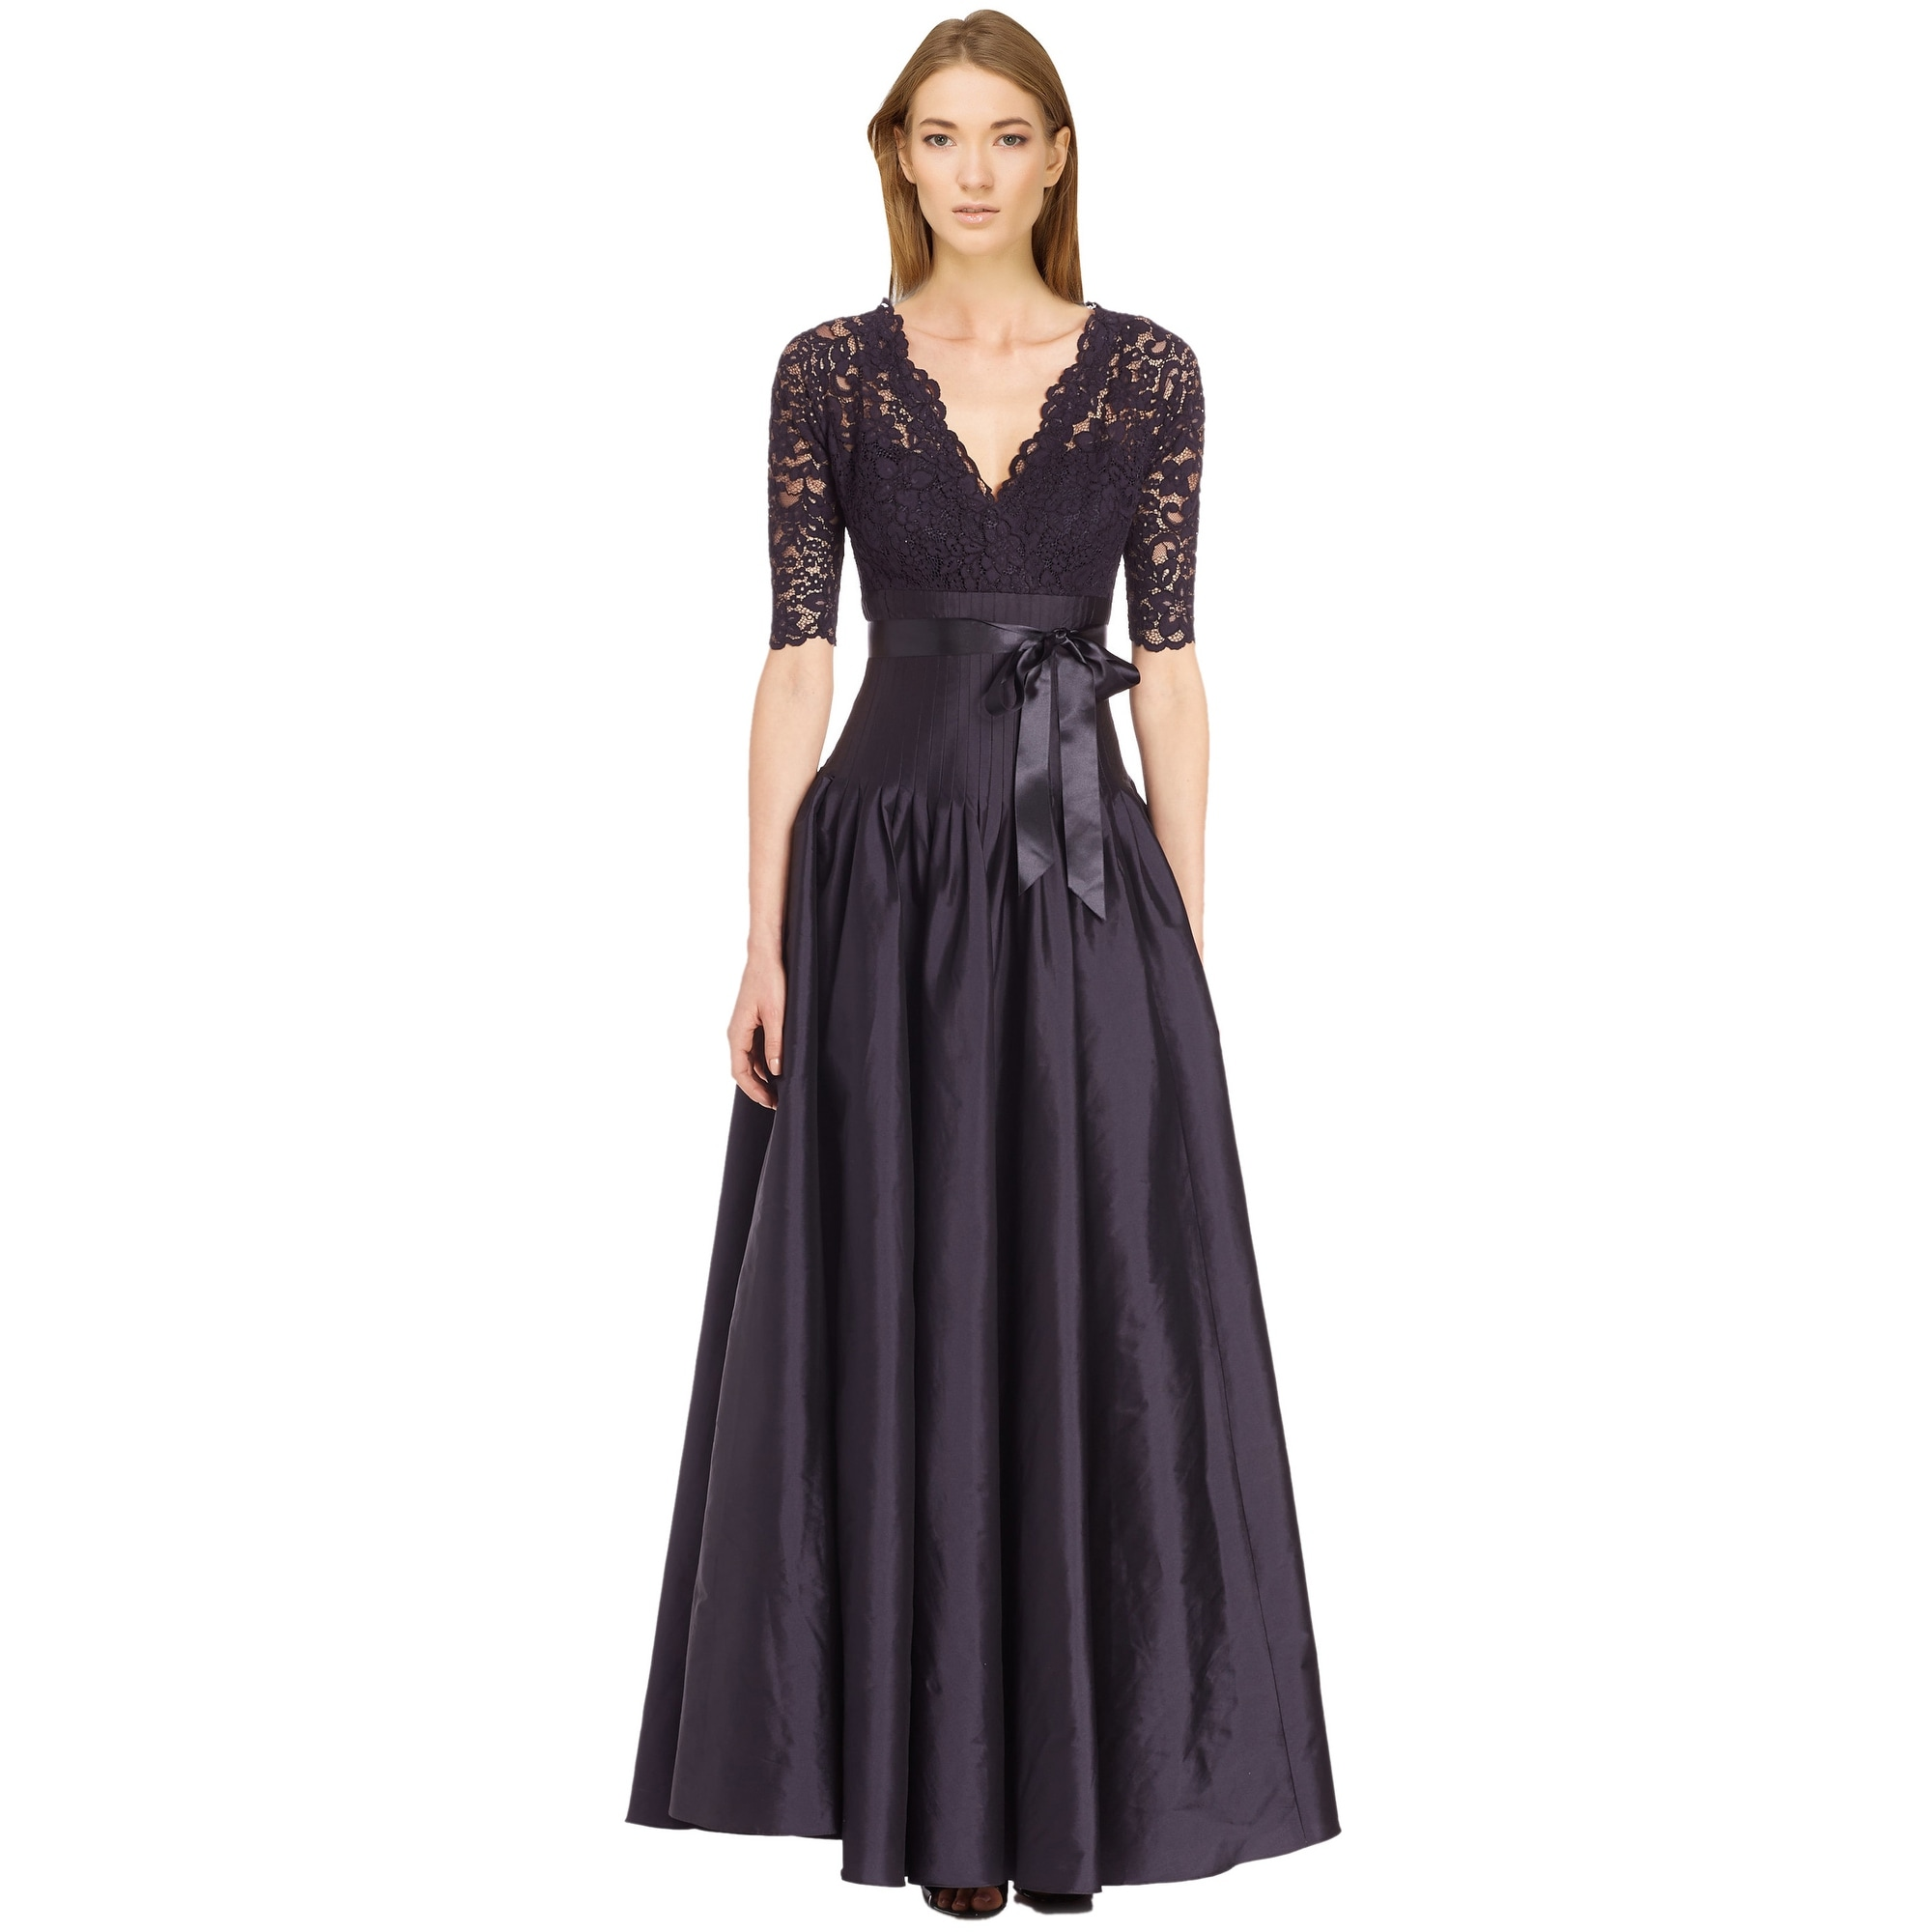 e13db2ef473b2 Shop Teri Jon Navy Lace   Taffeta V-Neck Pleated Ball Gown Dress - 6 ...